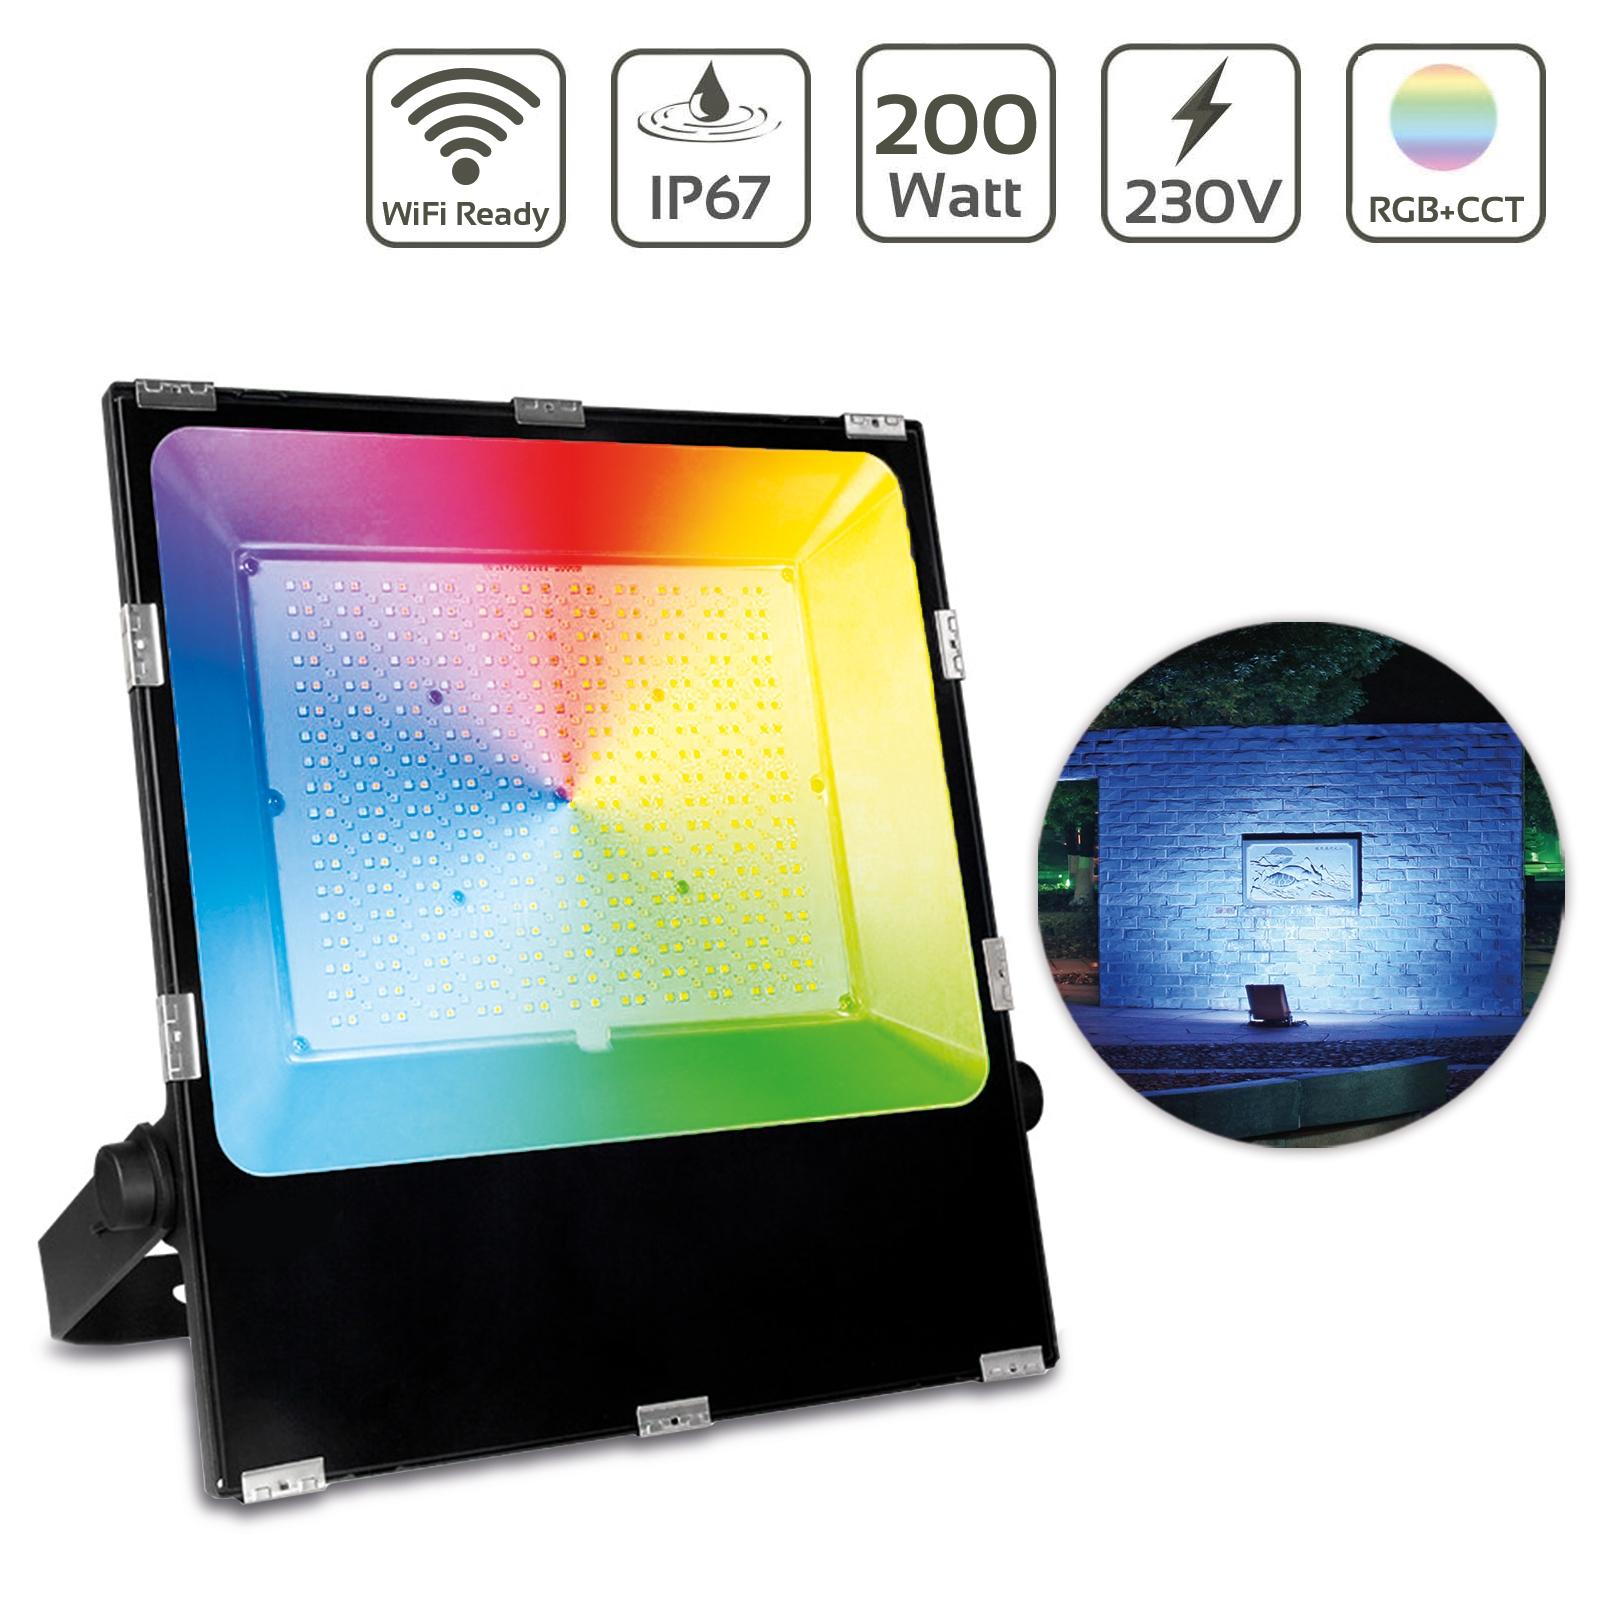 MiBoxer 200W RGB+CCT LED Außenstrahler WiFi Farbwechsel Fluter FUTT08